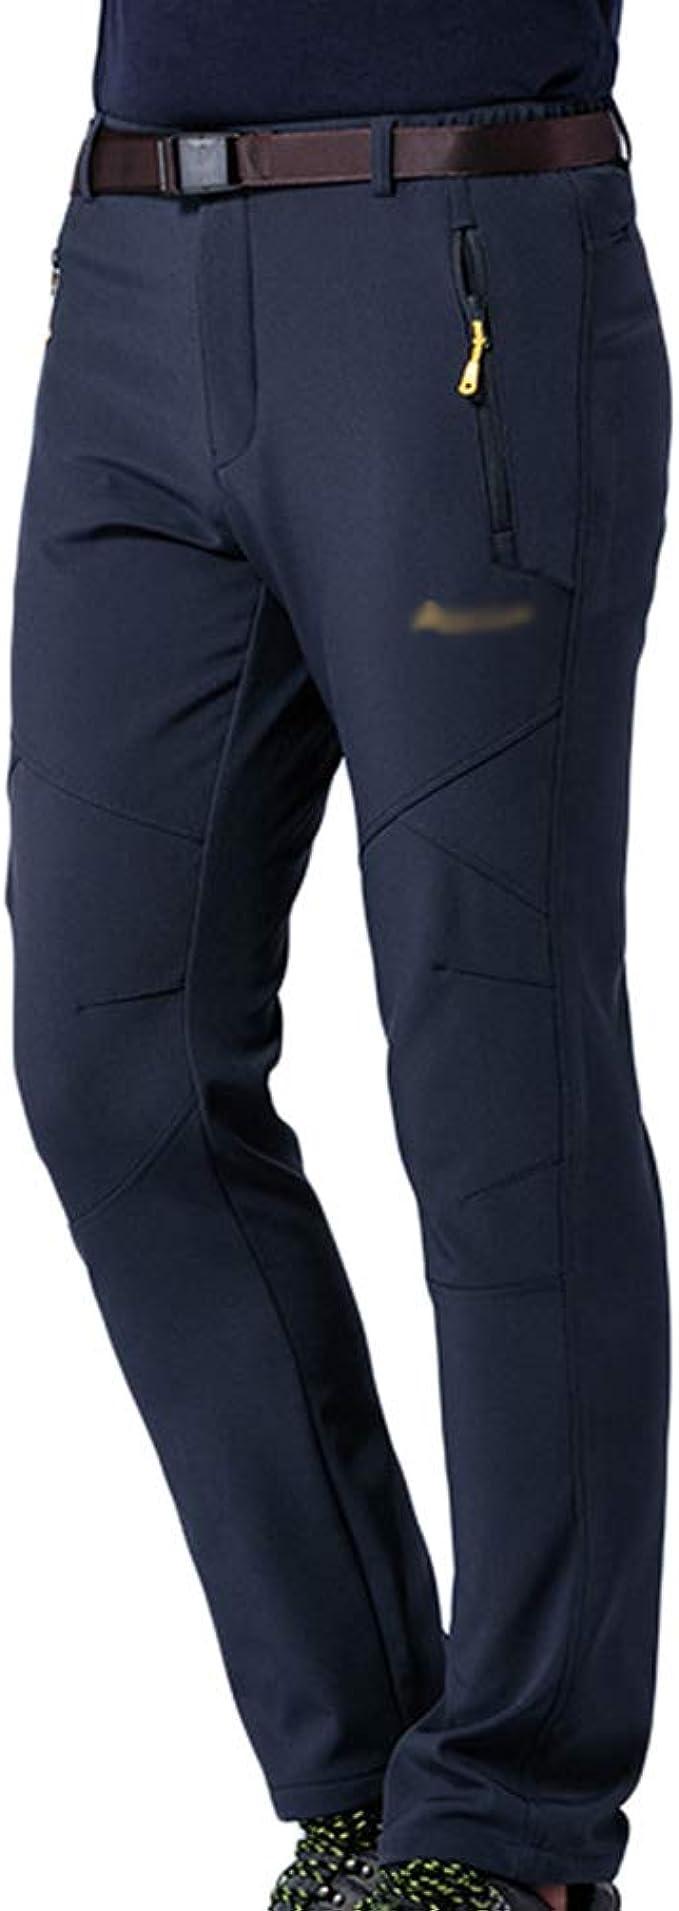 antiabrasione impermeabili caldi antivento pantaloni da uomo sportivi pantaloni da trekking autunno//inverno traspiranti Gitvienar foderati